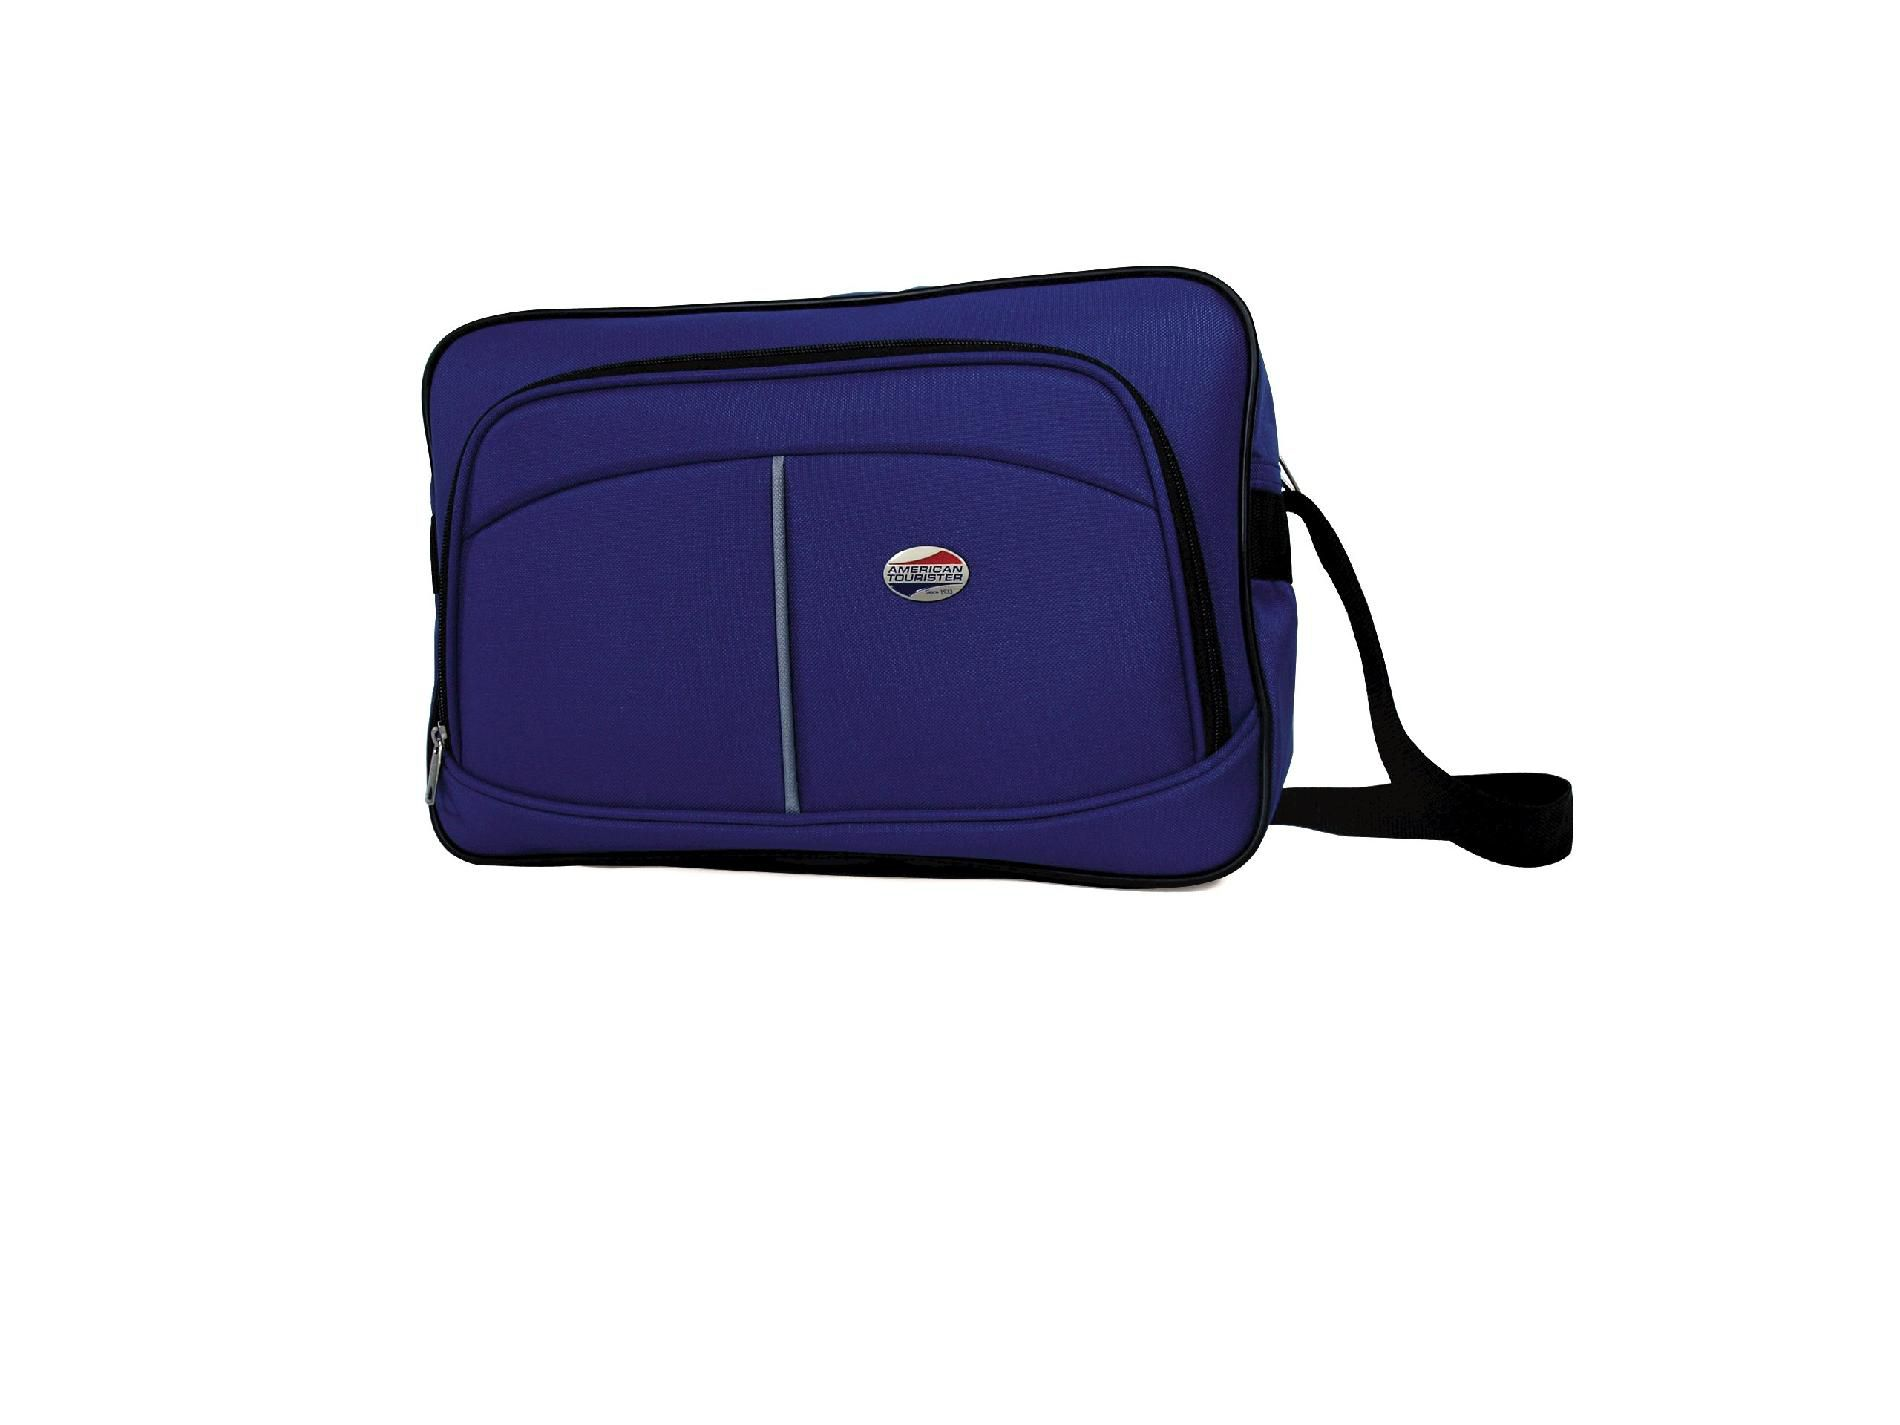 American Tourister 2pc Set (Sapphire Blue)